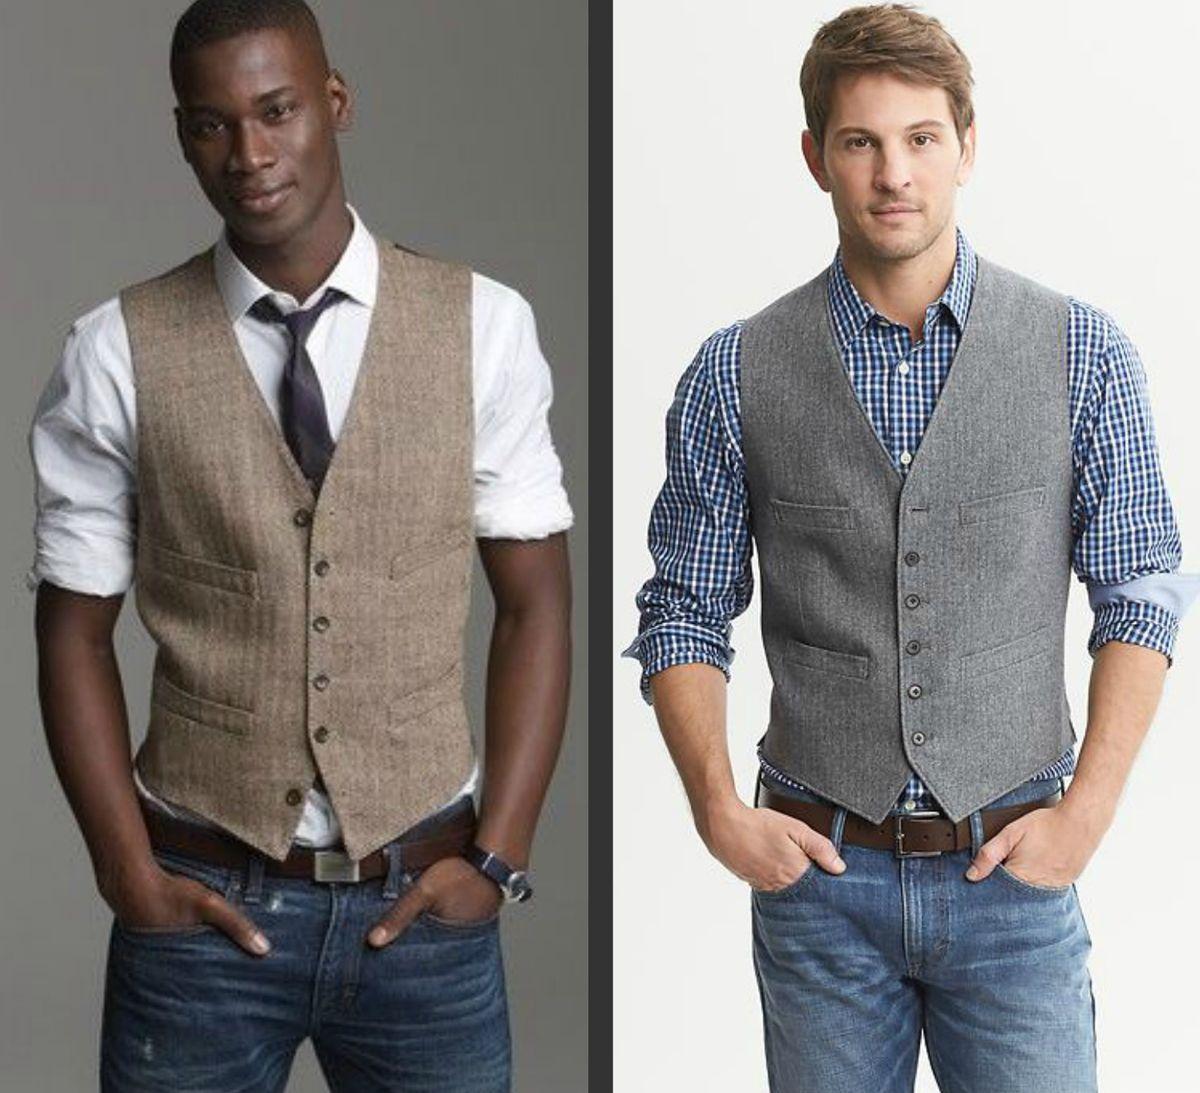 Men Waistcoat Styles -18 Ways to Wear Waistcoat for Classy Look Men Waistcoat Styles -18 Ways to Wear Waistcoat for Classy Look new photo